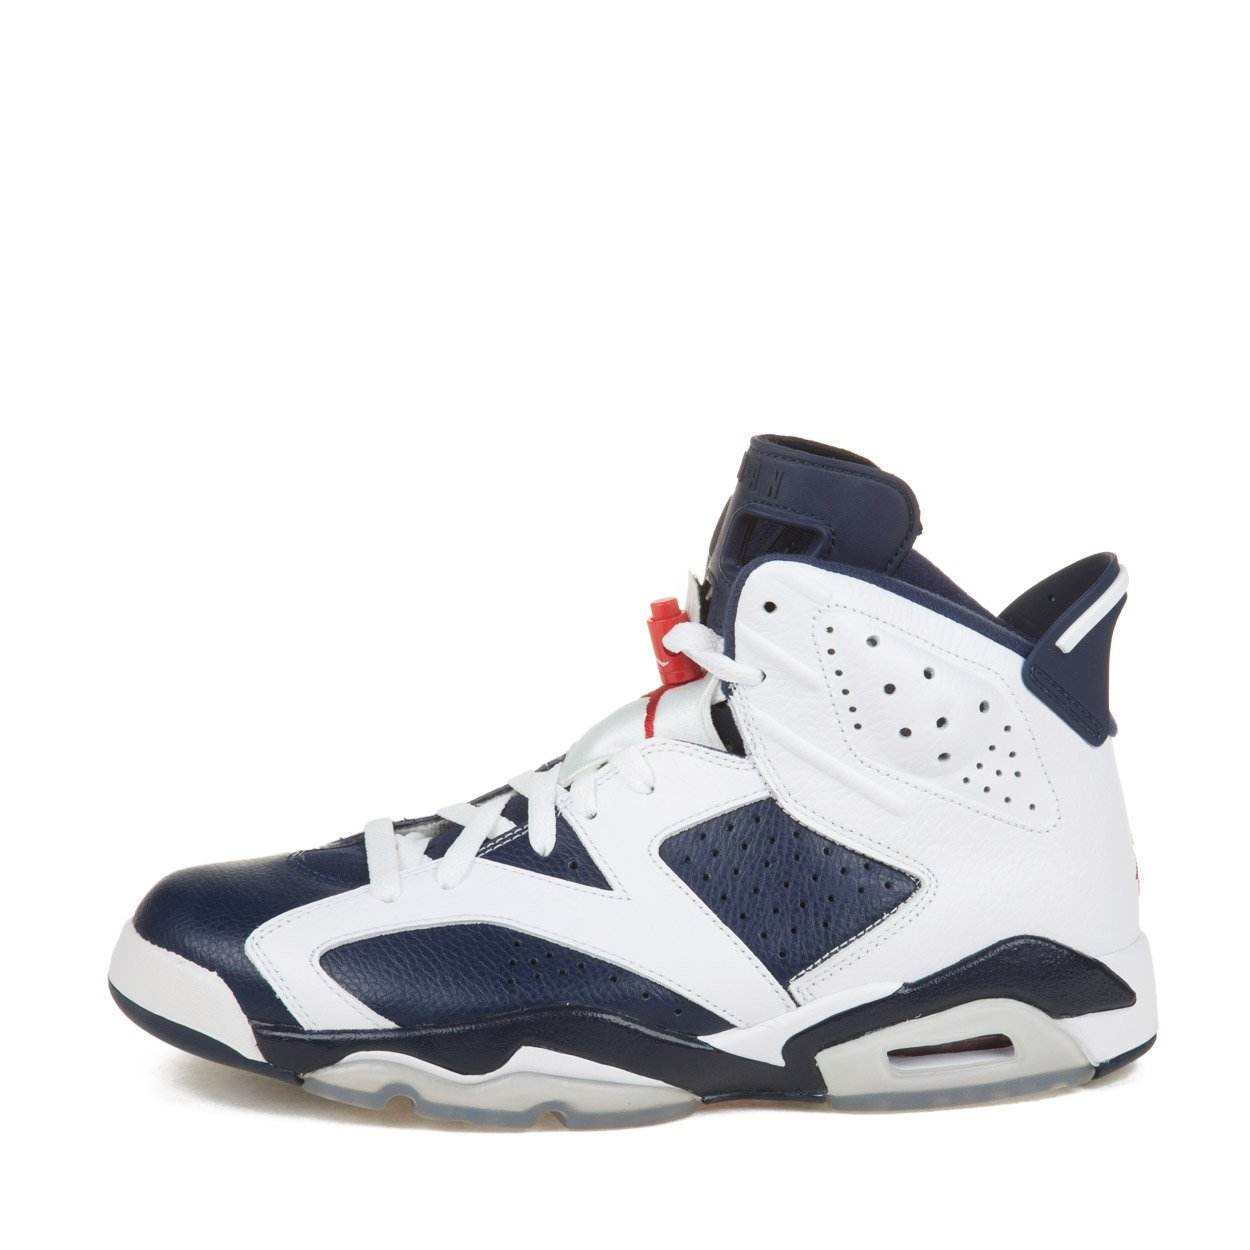 44e2e0d3b4ac Galleon - Nike Mens Air Jordan 6 Retro